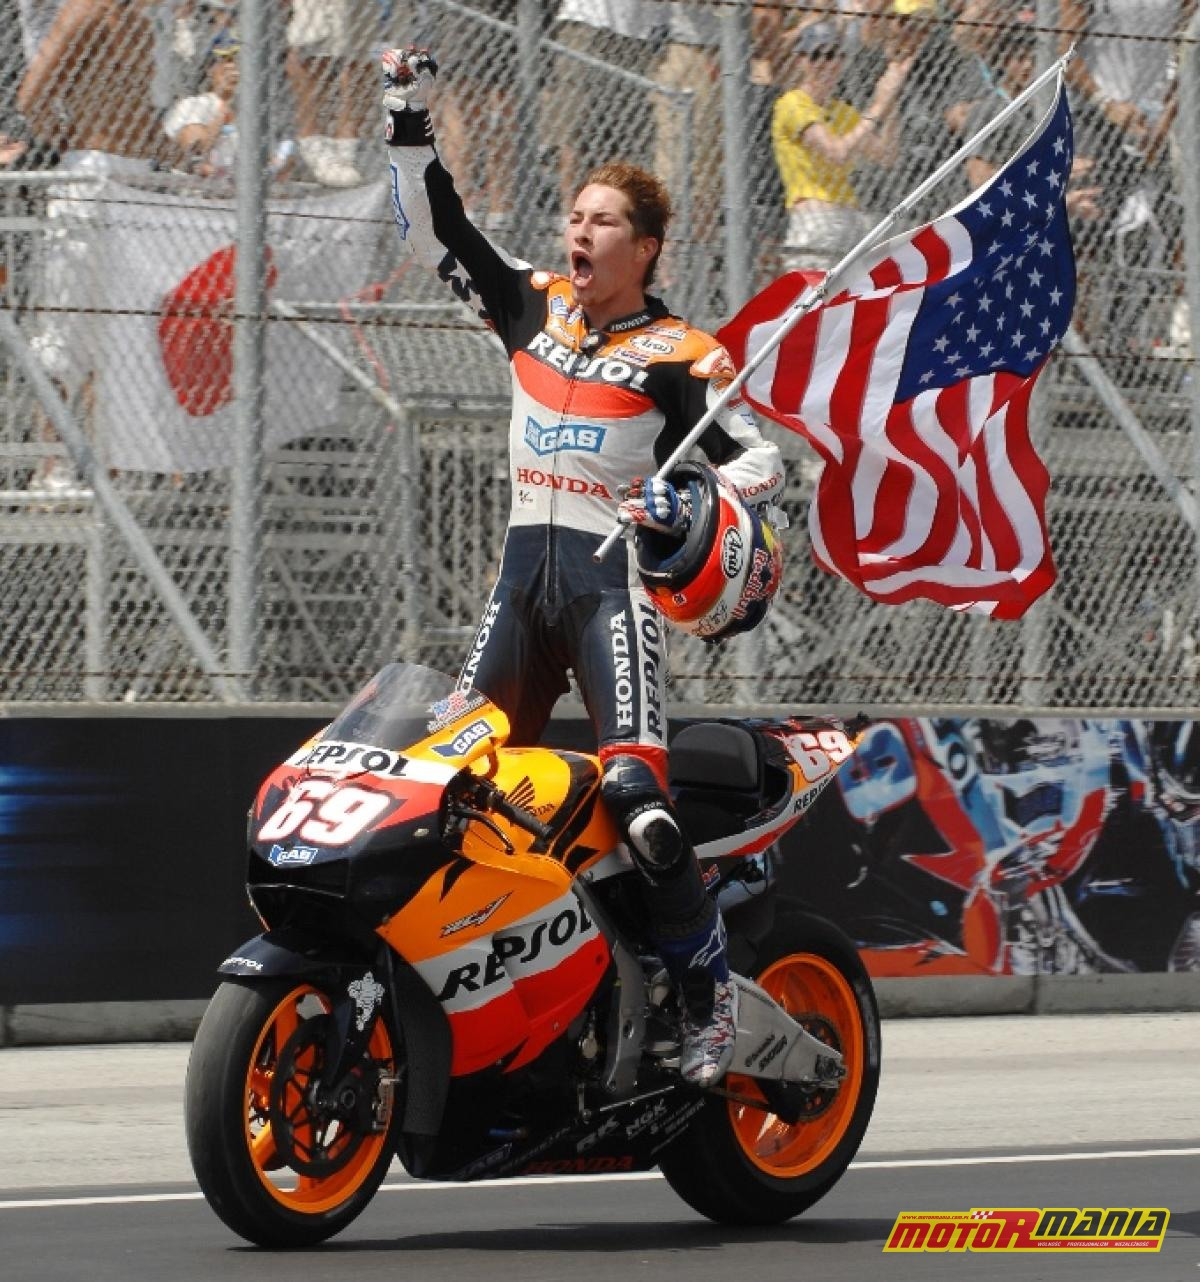 Nicky Hayden Laguna Seca 2006